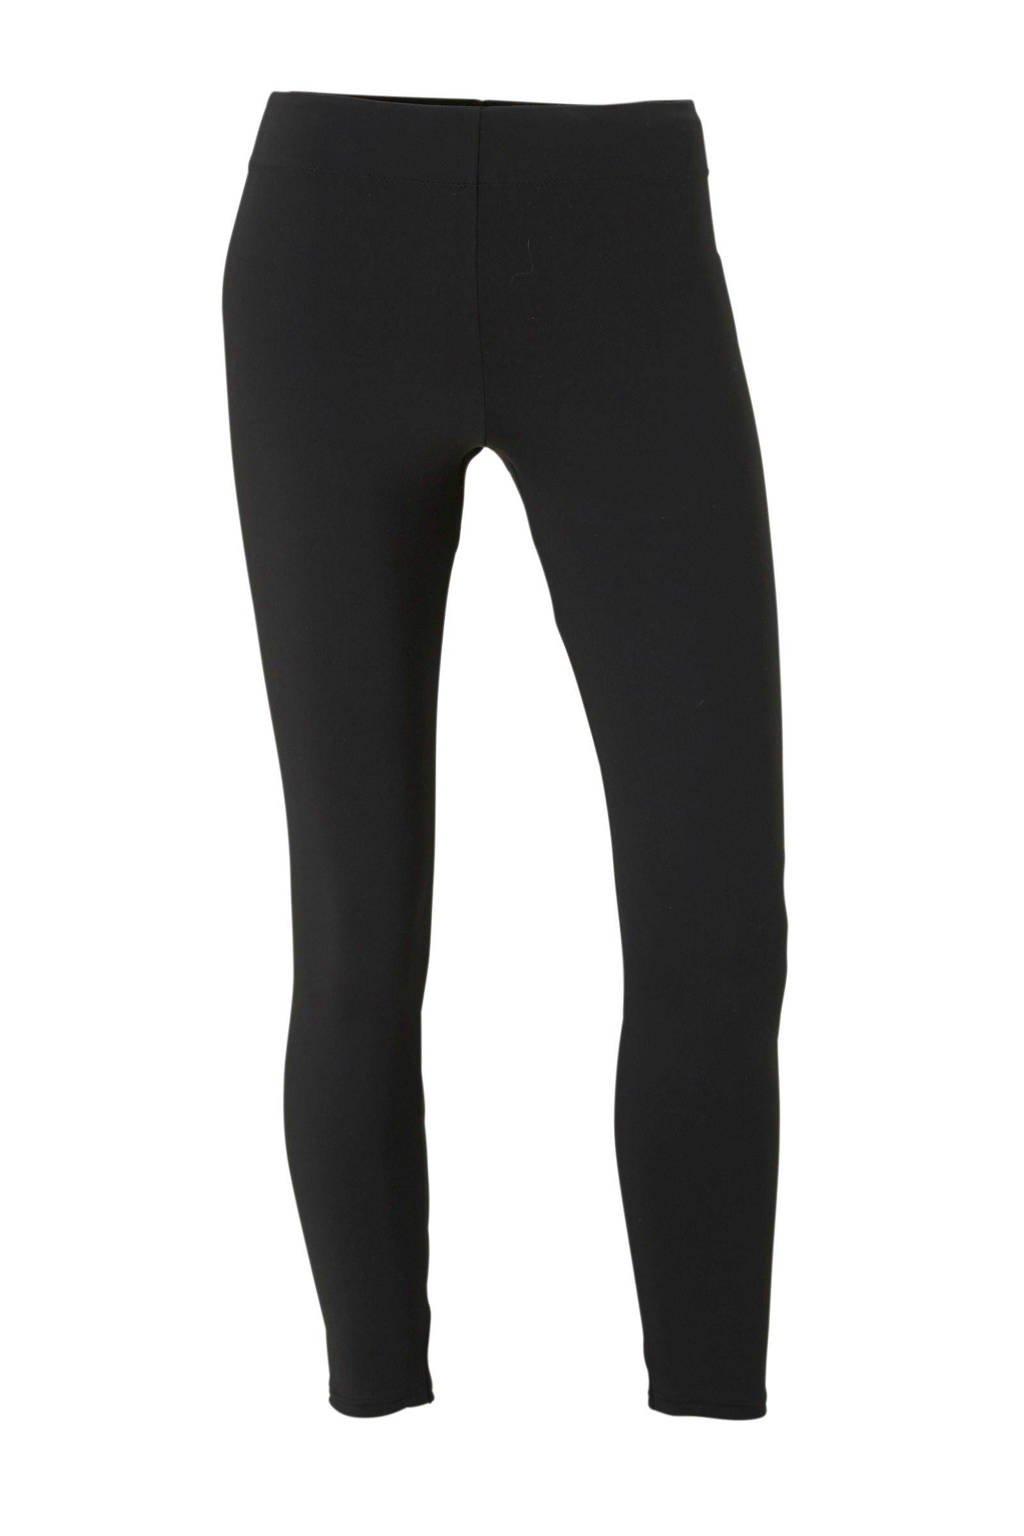 Maidenform corrigerende legging Fat Free Dressing zwart, Zwart